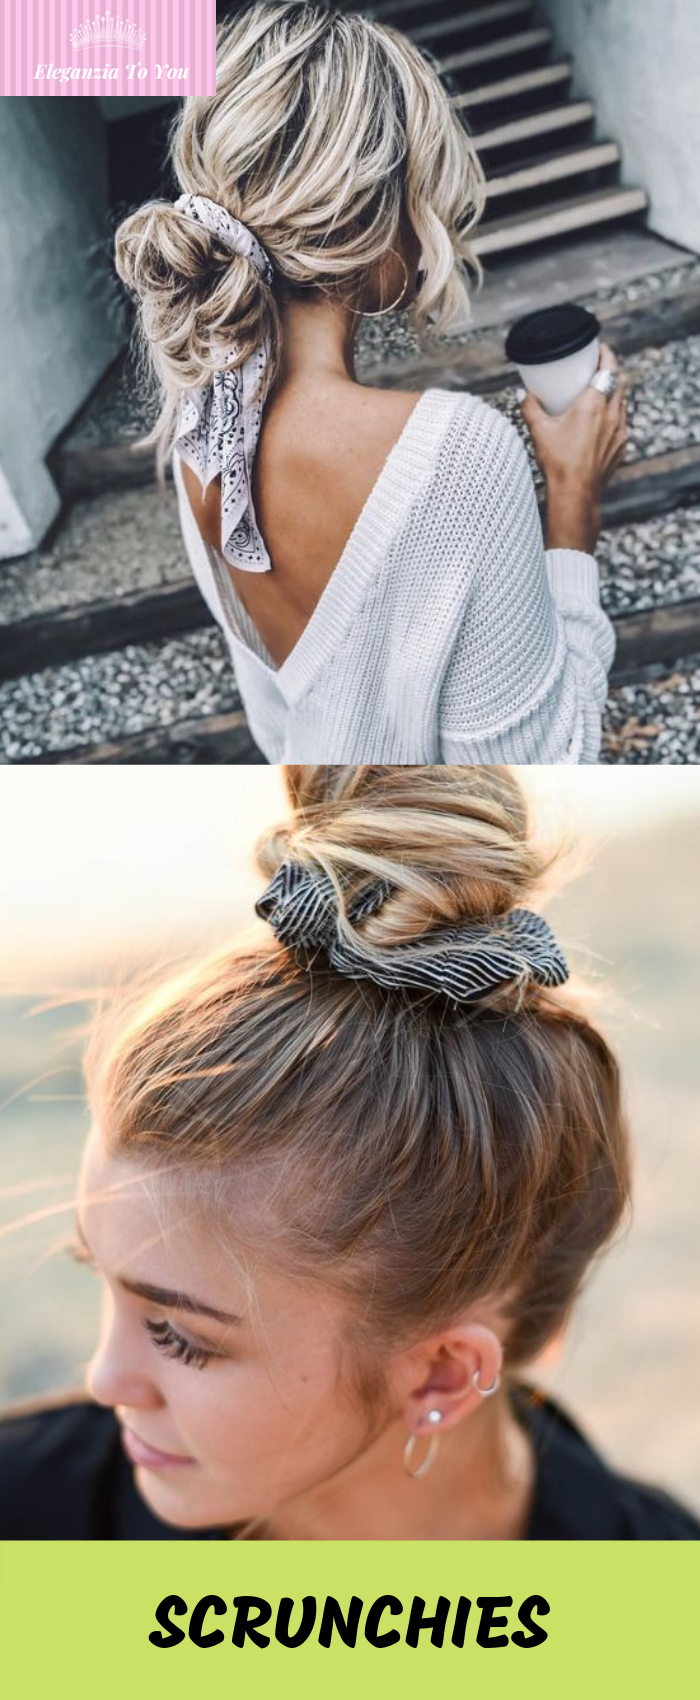 velvet scrunchies hair band | scrunchies hairstyles in 2019